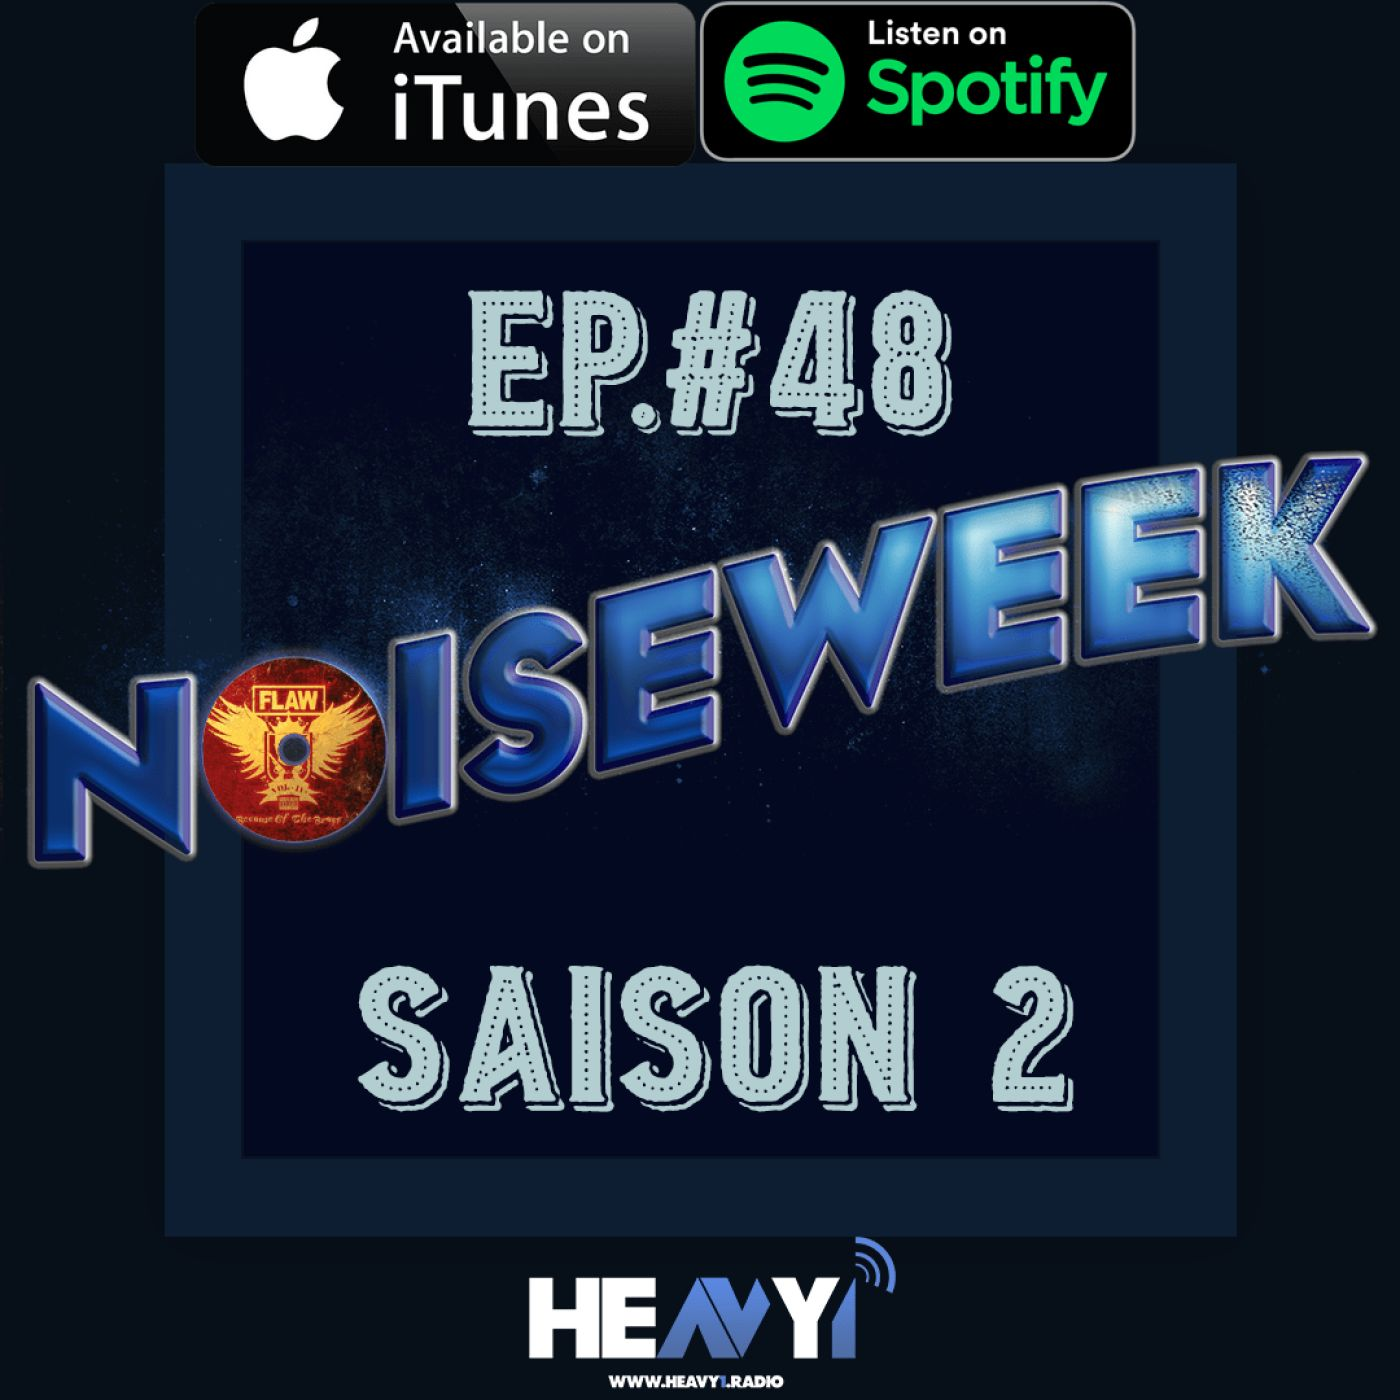 Noiseweek #48 Saison 2